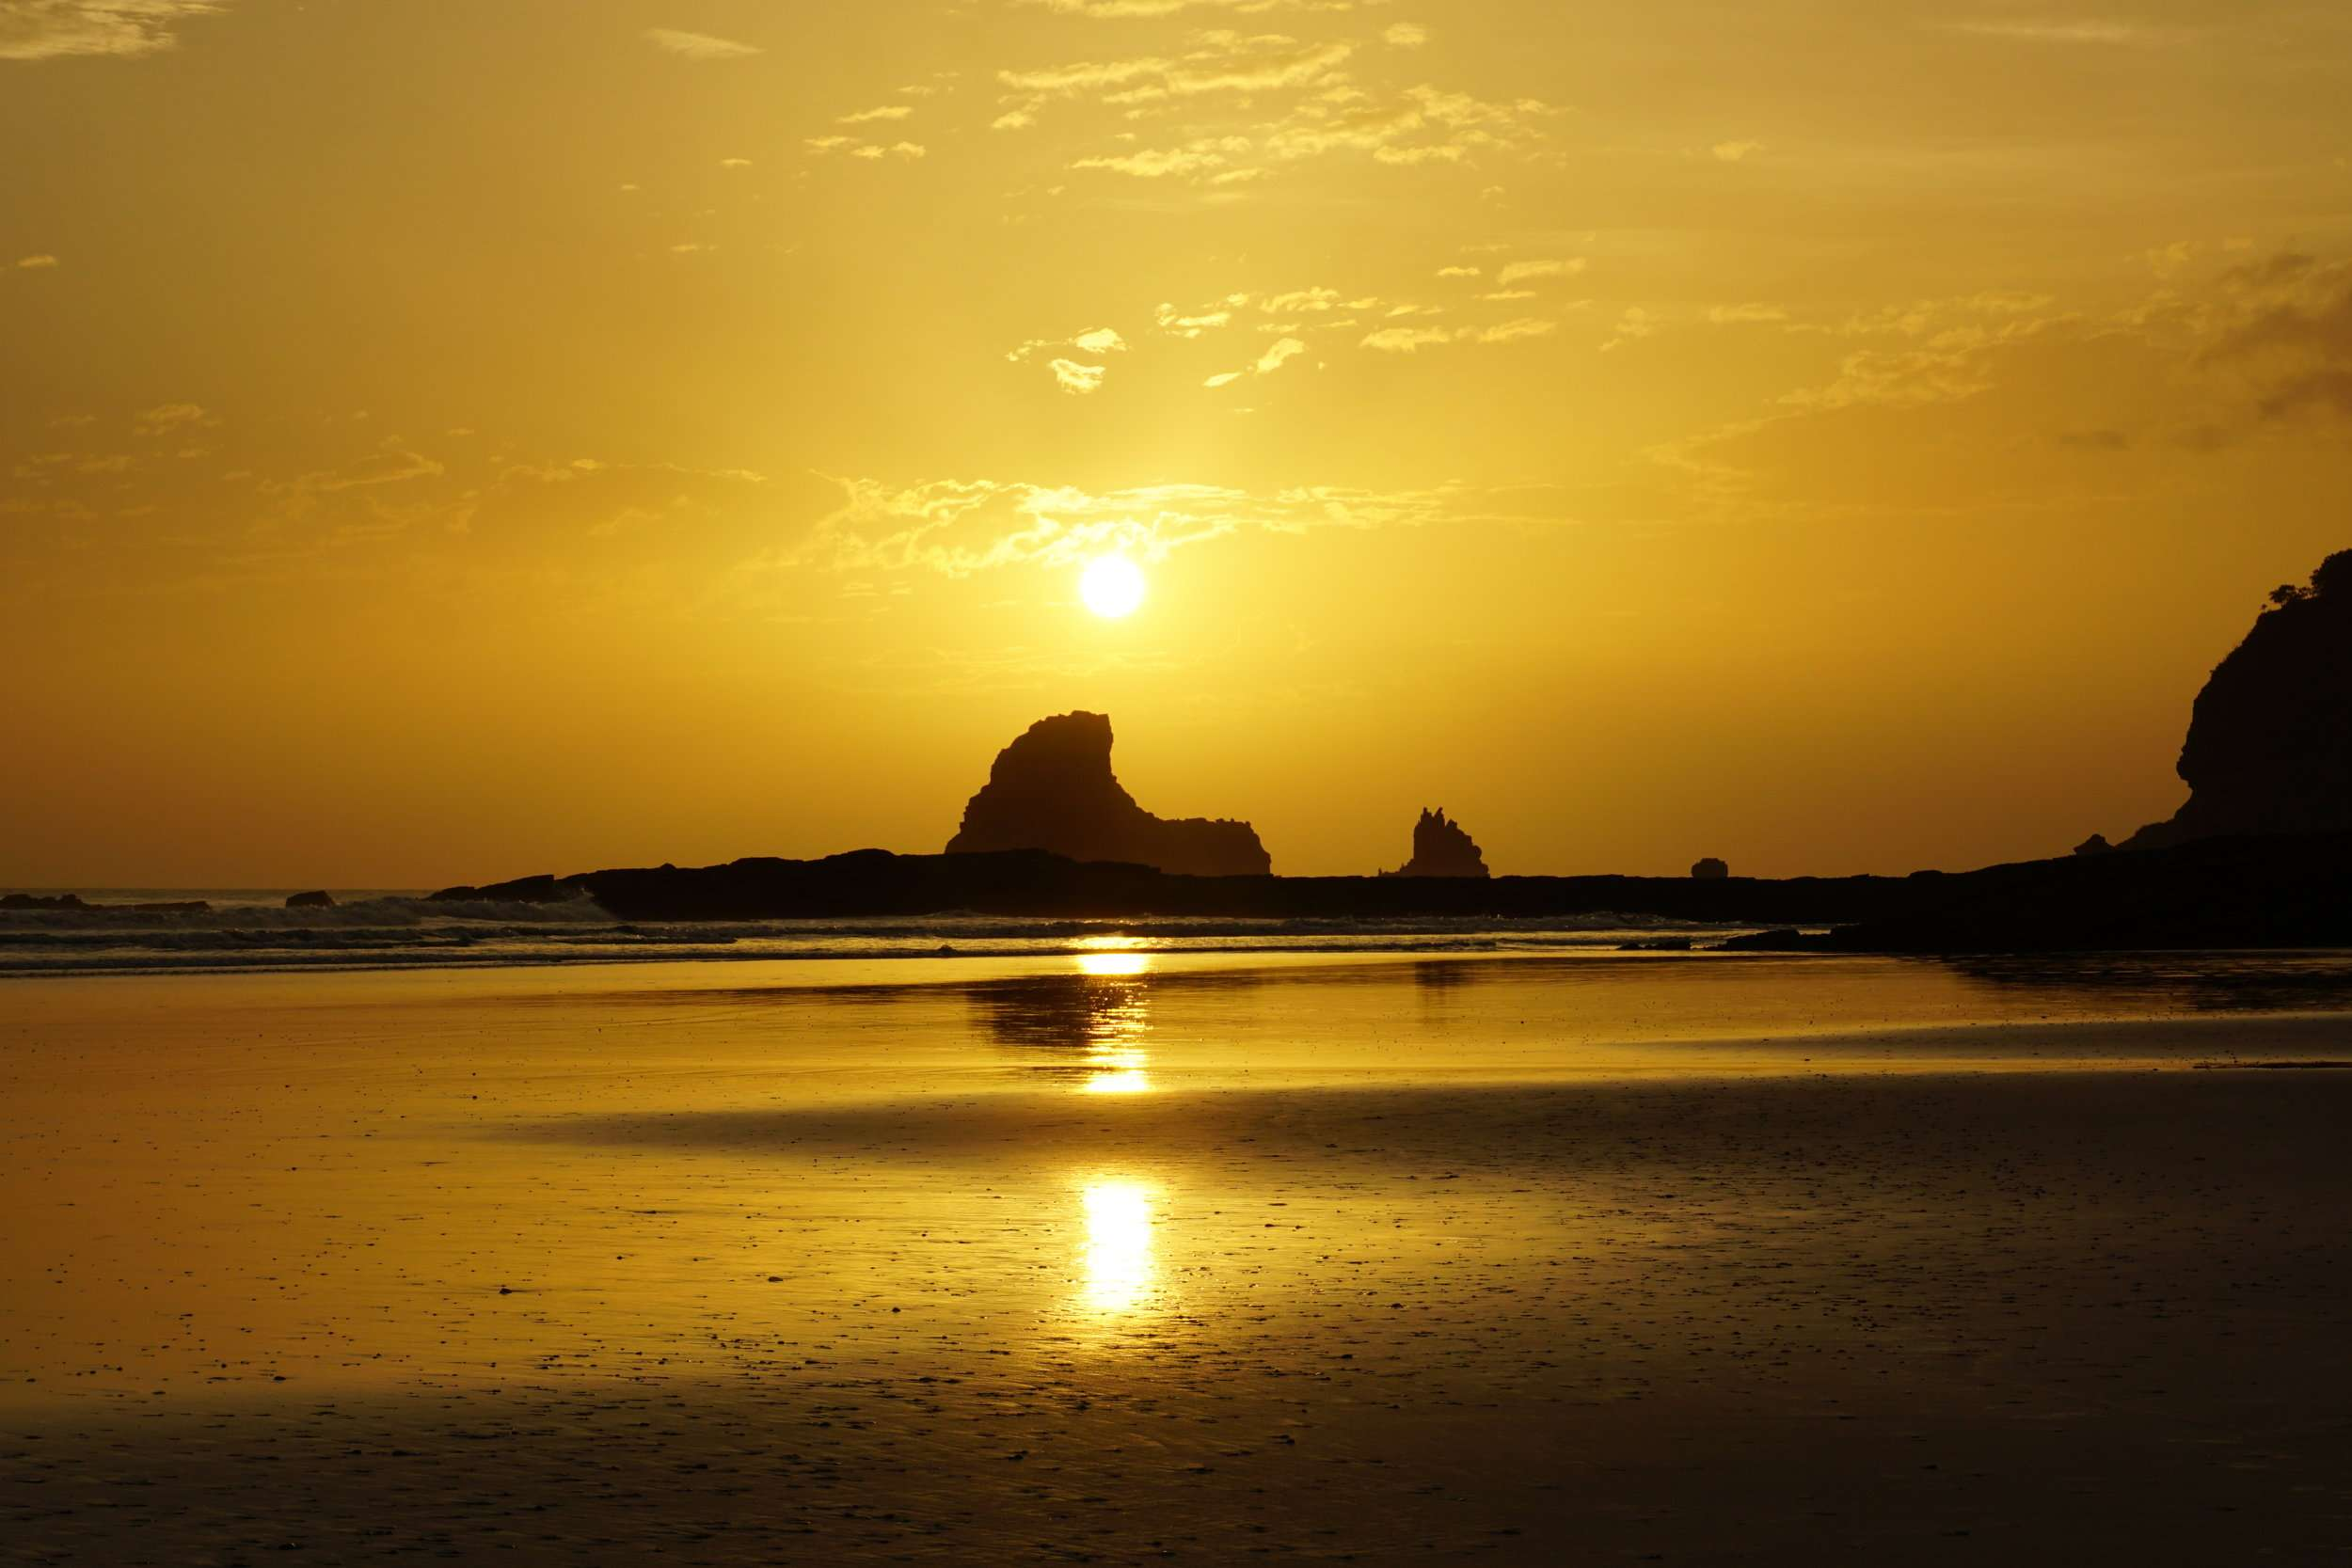 Golden sunset at Playa Maderas in Nicaragua